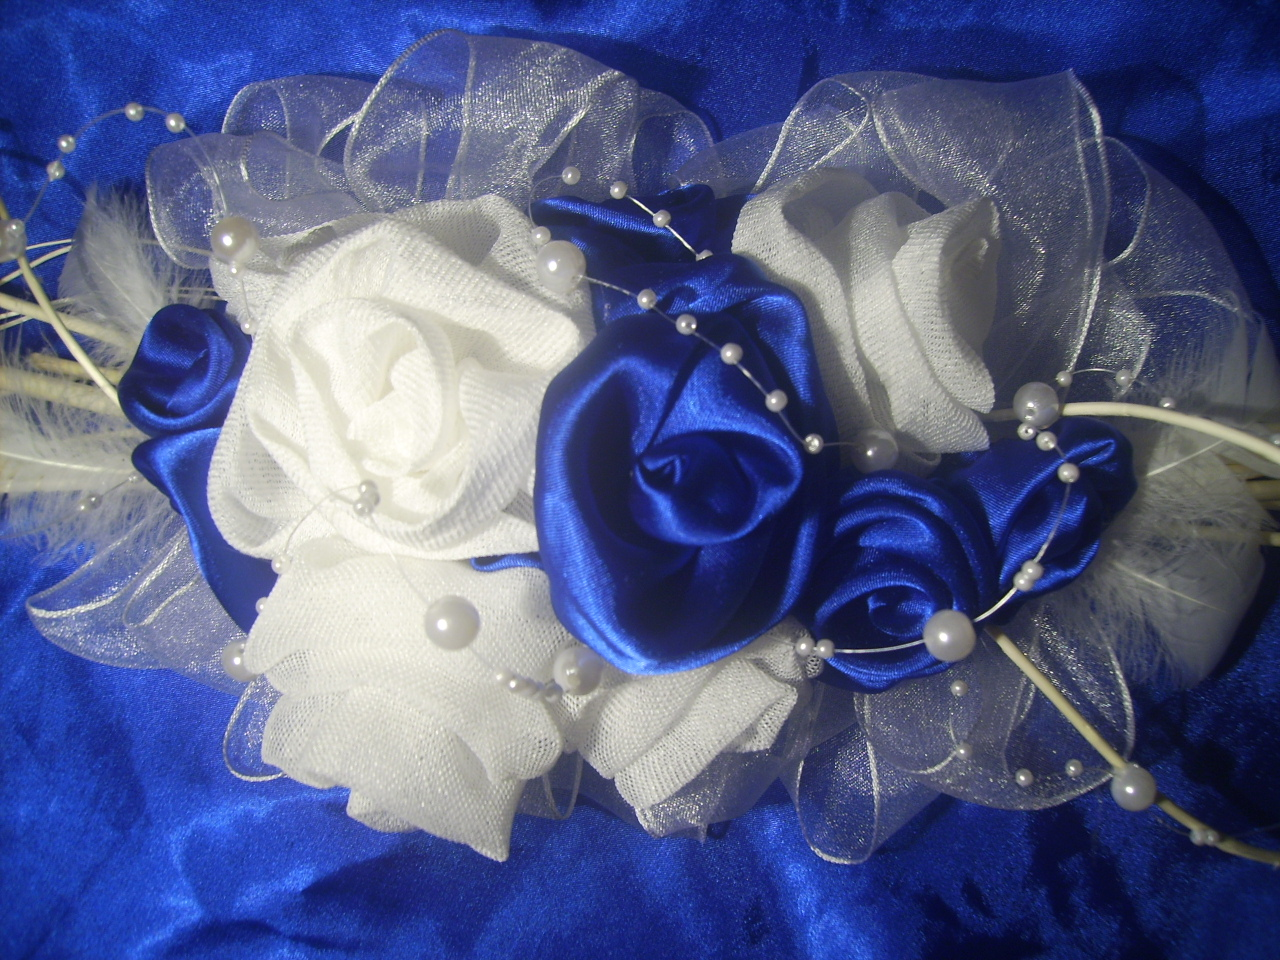 Dekorace Na Svatebni Tabuli Kralovska Modr Zbozi Prodejce Ketyna